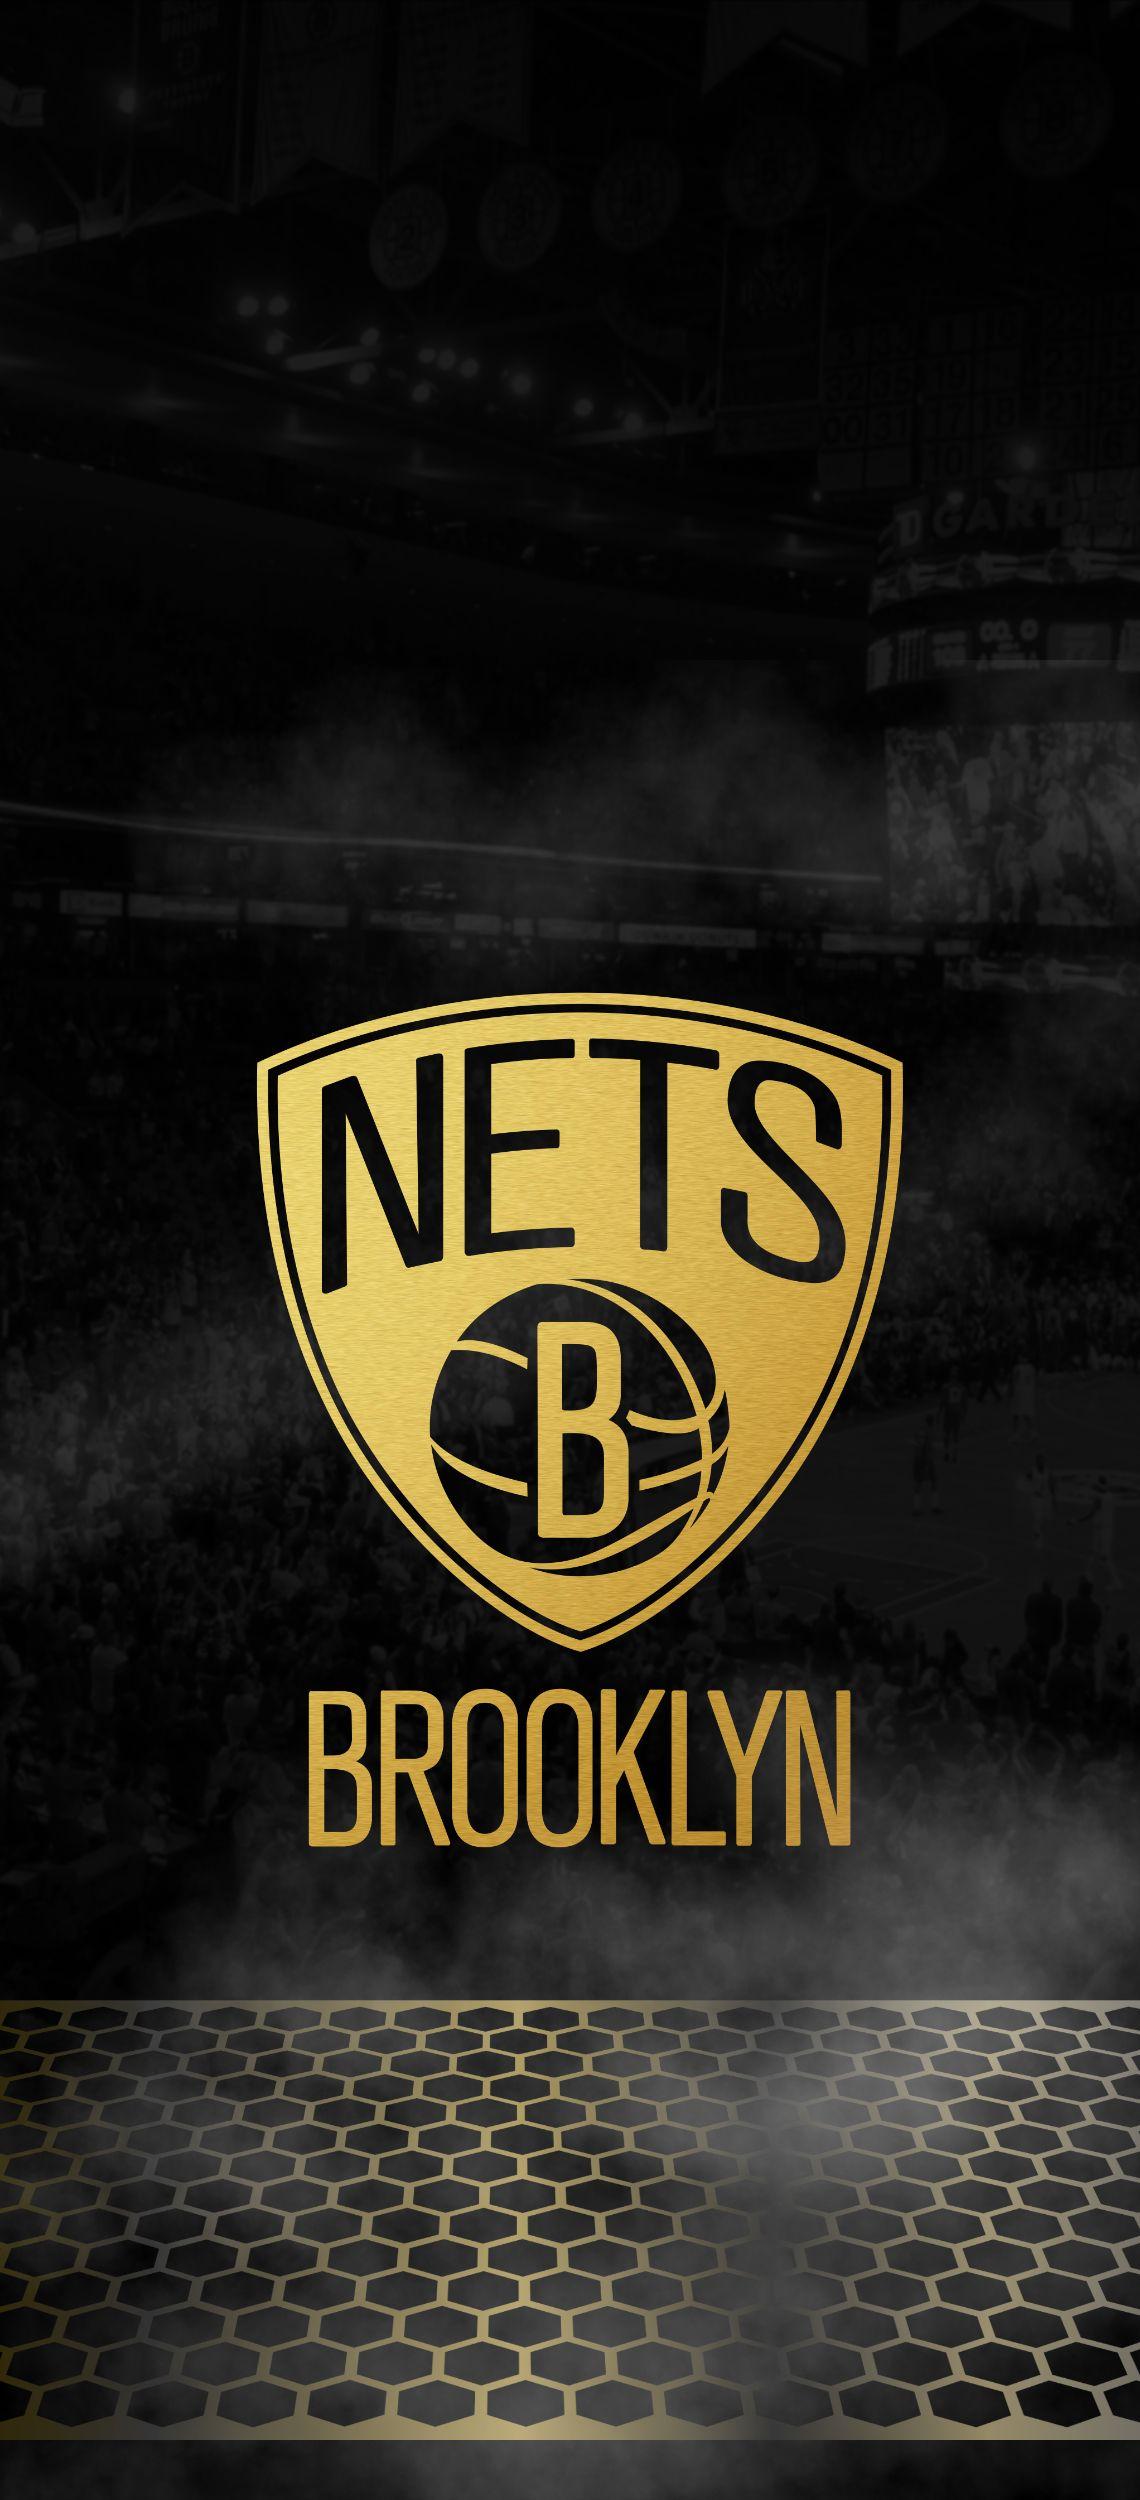 sportsign Shop Redbubble Brooklyn nets, Brooklyn, Nba